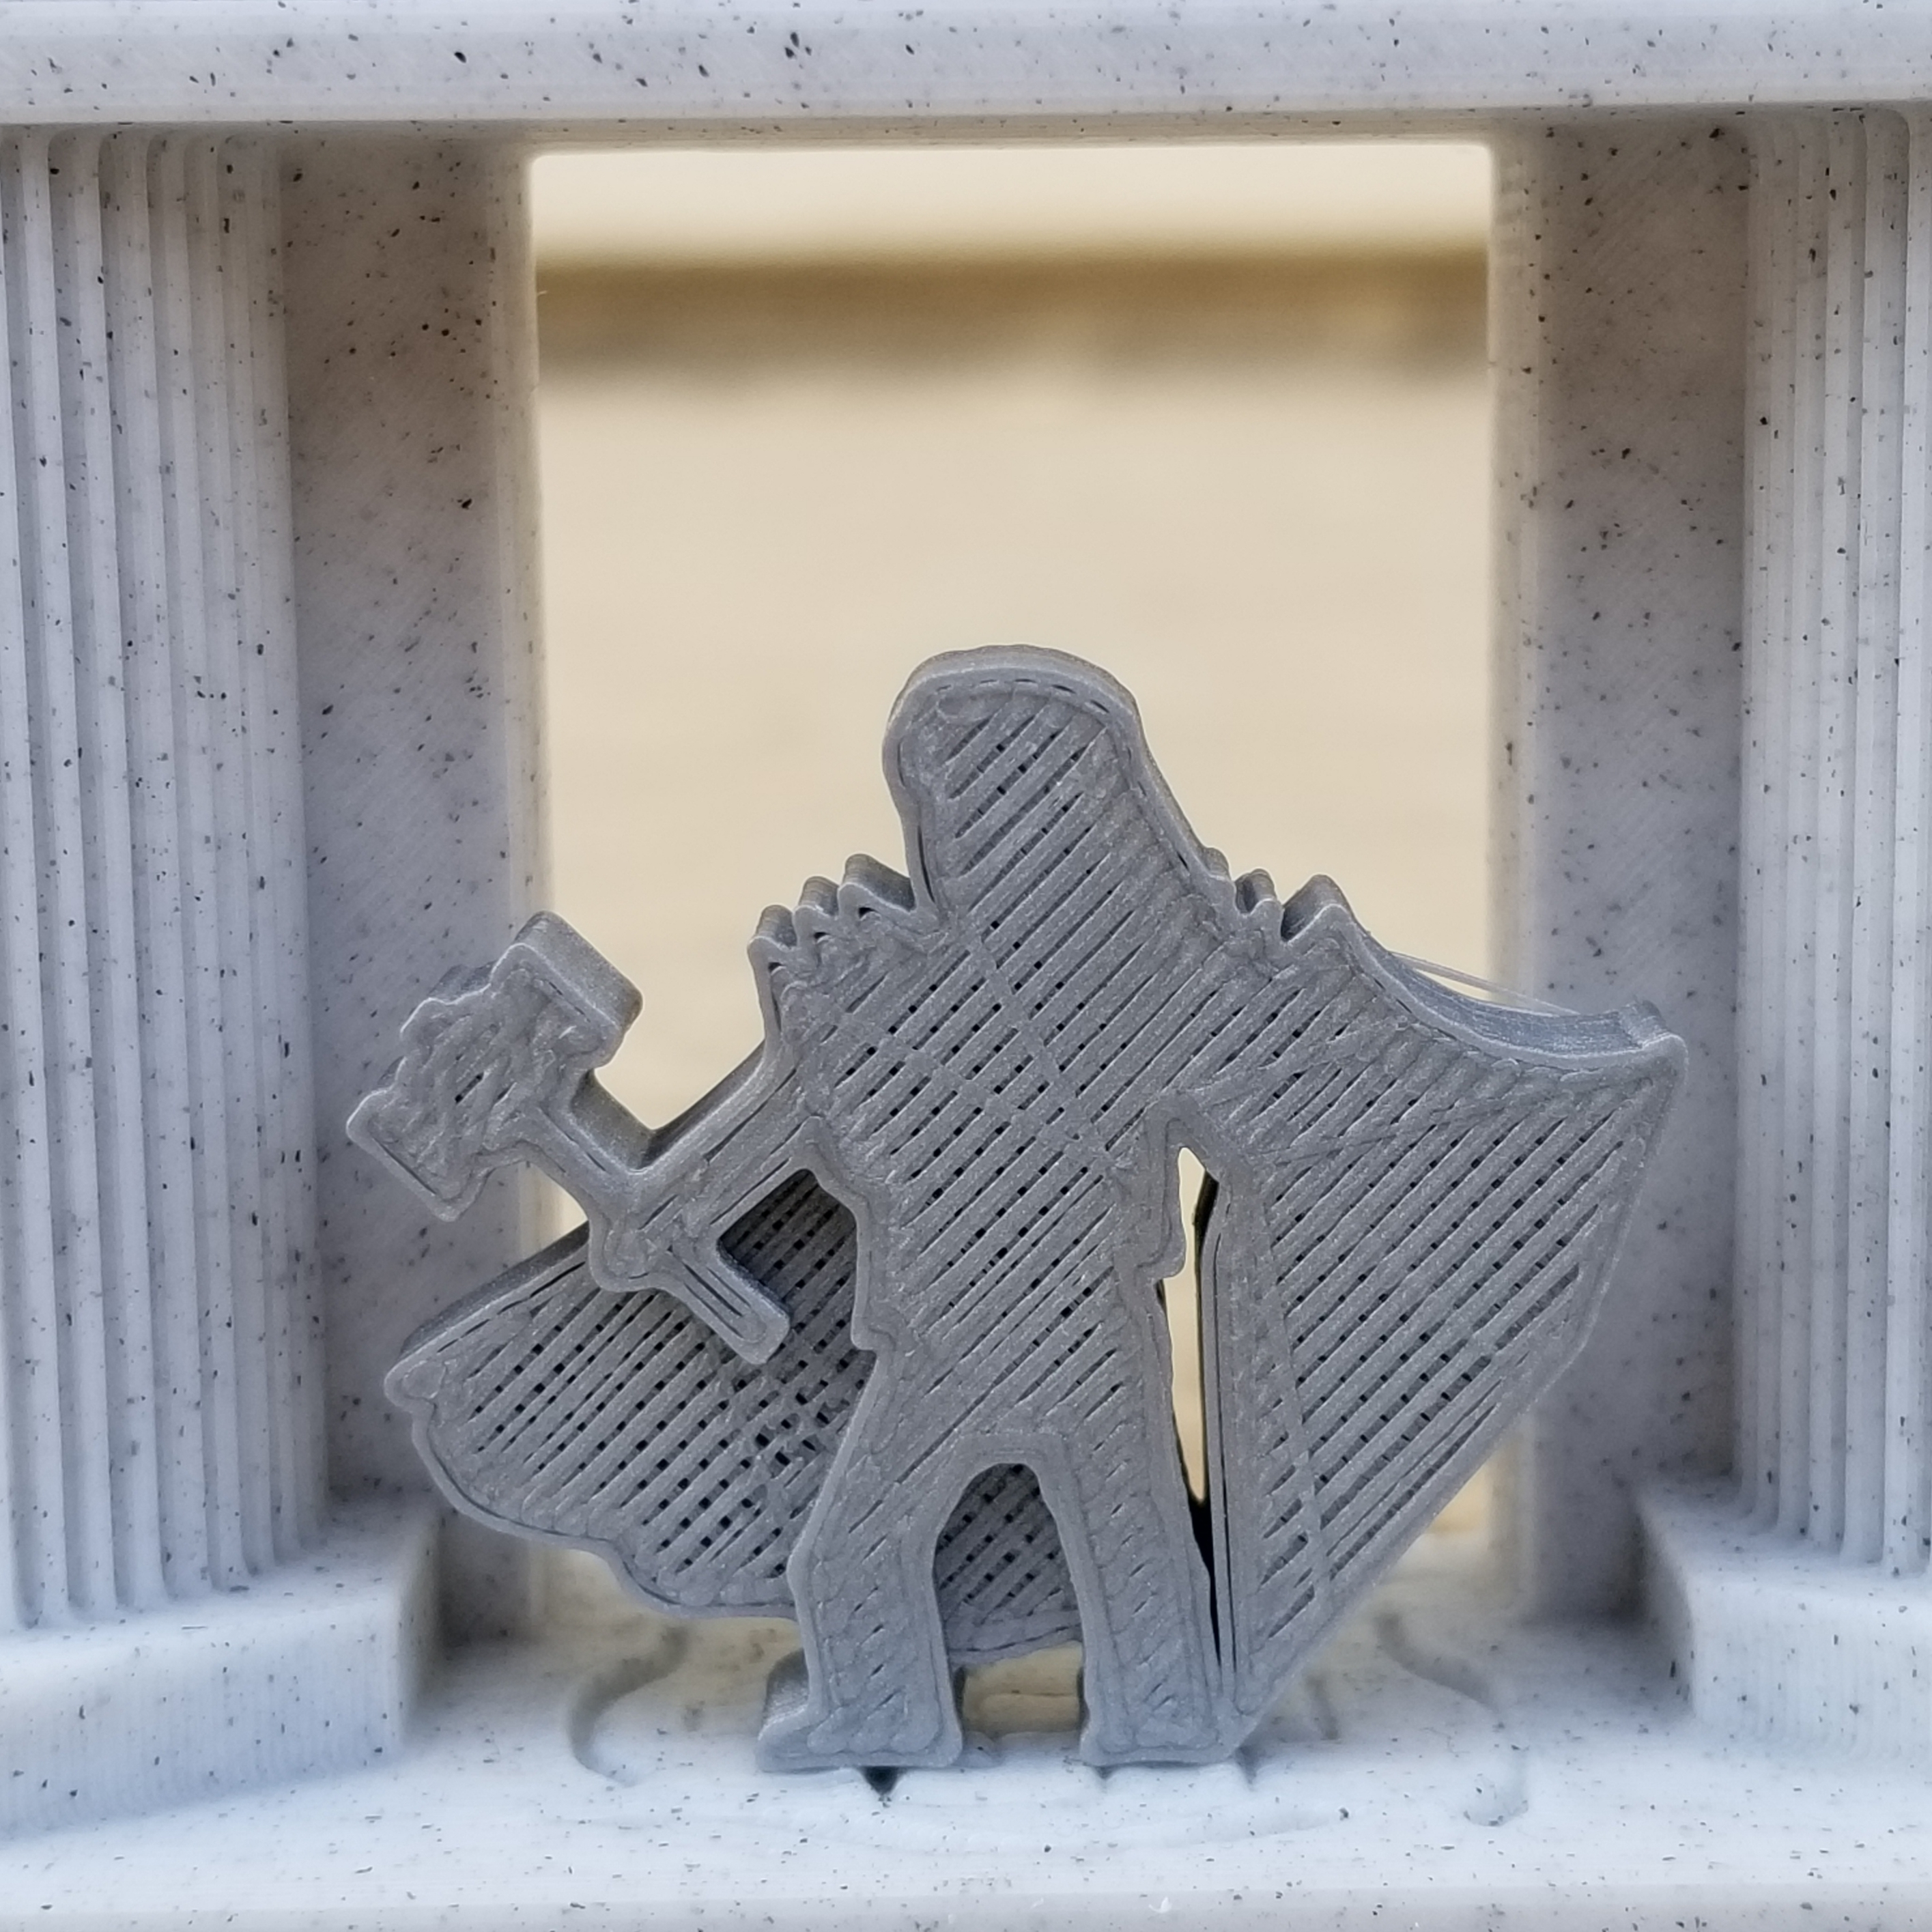 Hammer Knight Meeple.jpg Download STL file Long-Haired Hammer Knight Meeple • 3D print design, Ellie_Valkyrie